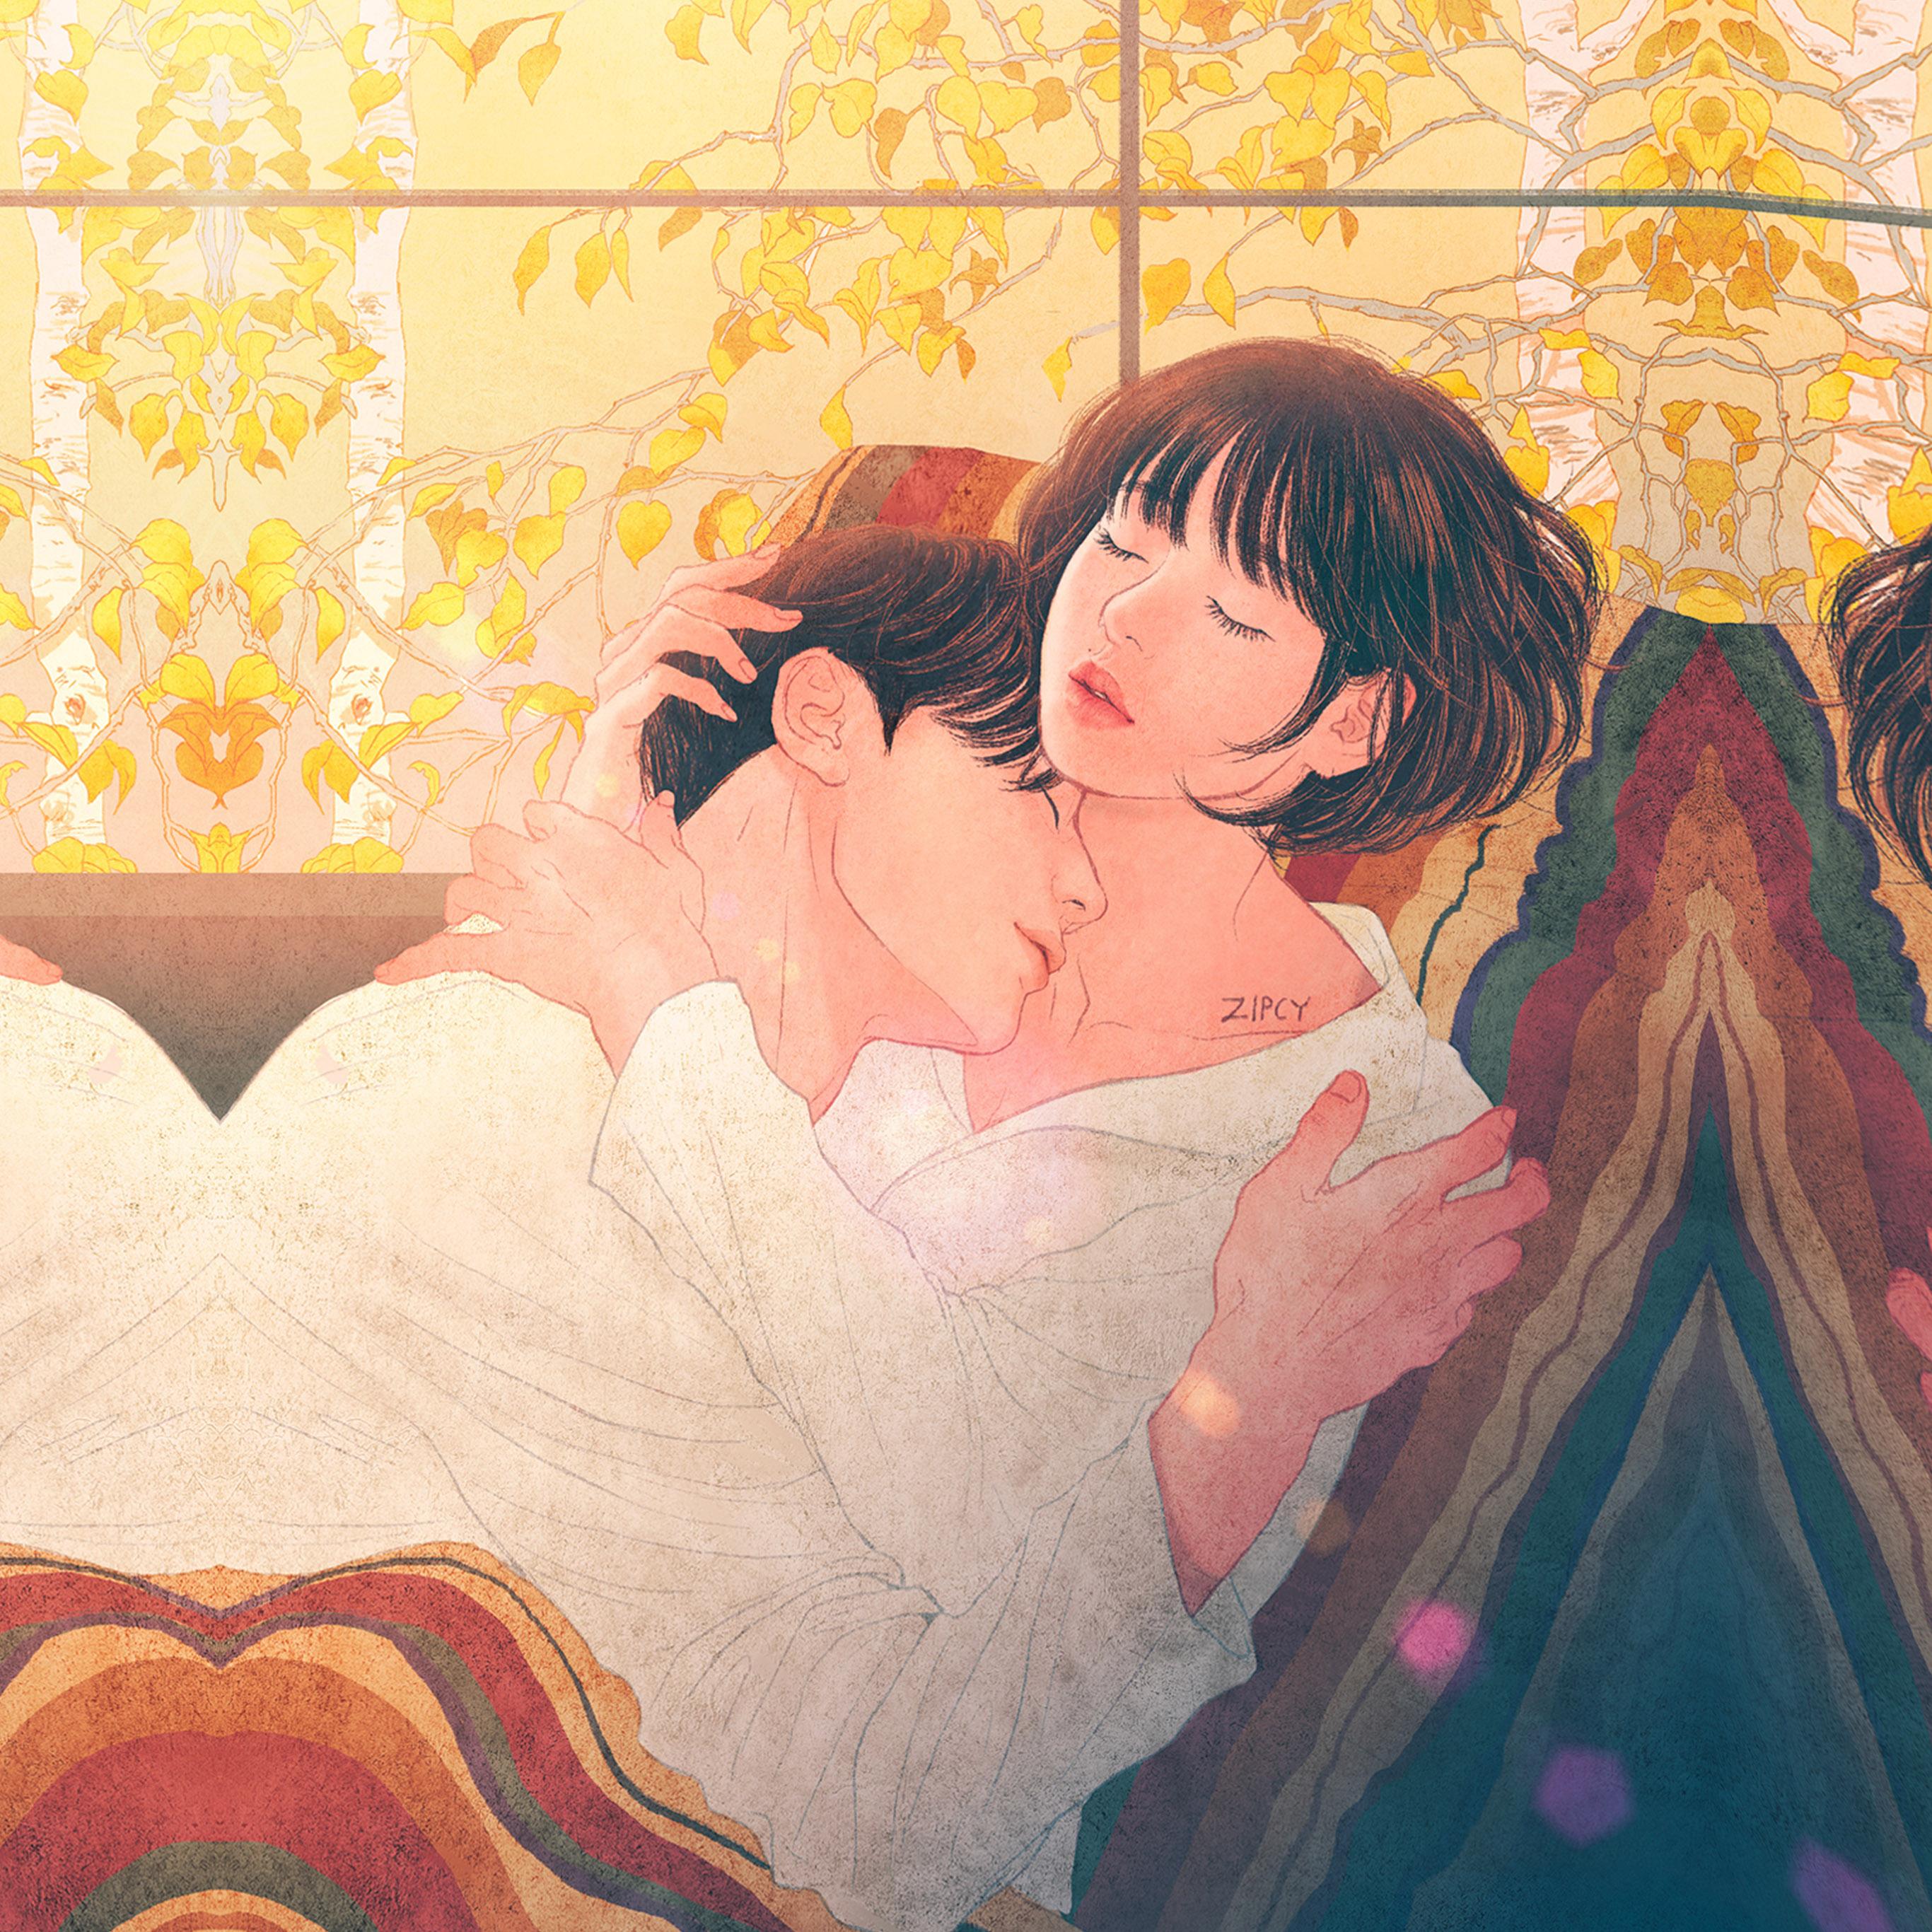 be01-zipcy-love-couple-art-illustration-anime-wallpaper